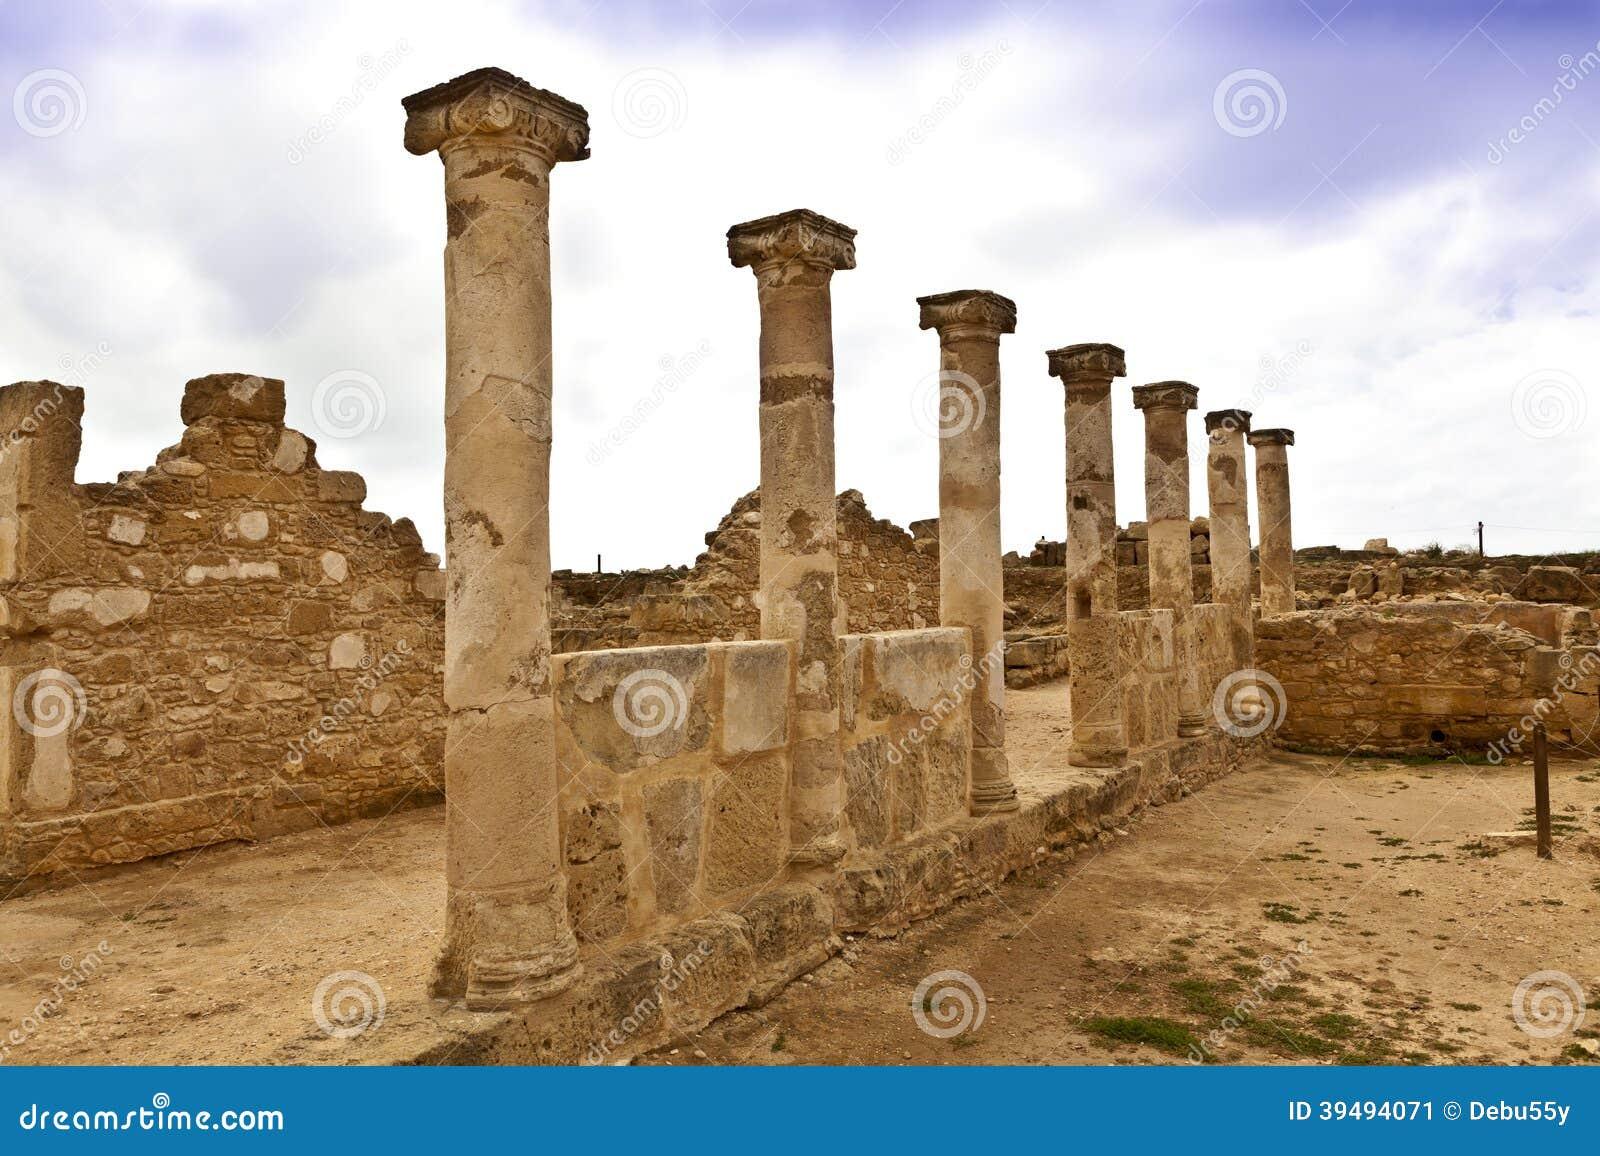 Roman Heritage Site In Paphos, Cyprus. Stock Photo - Image ...